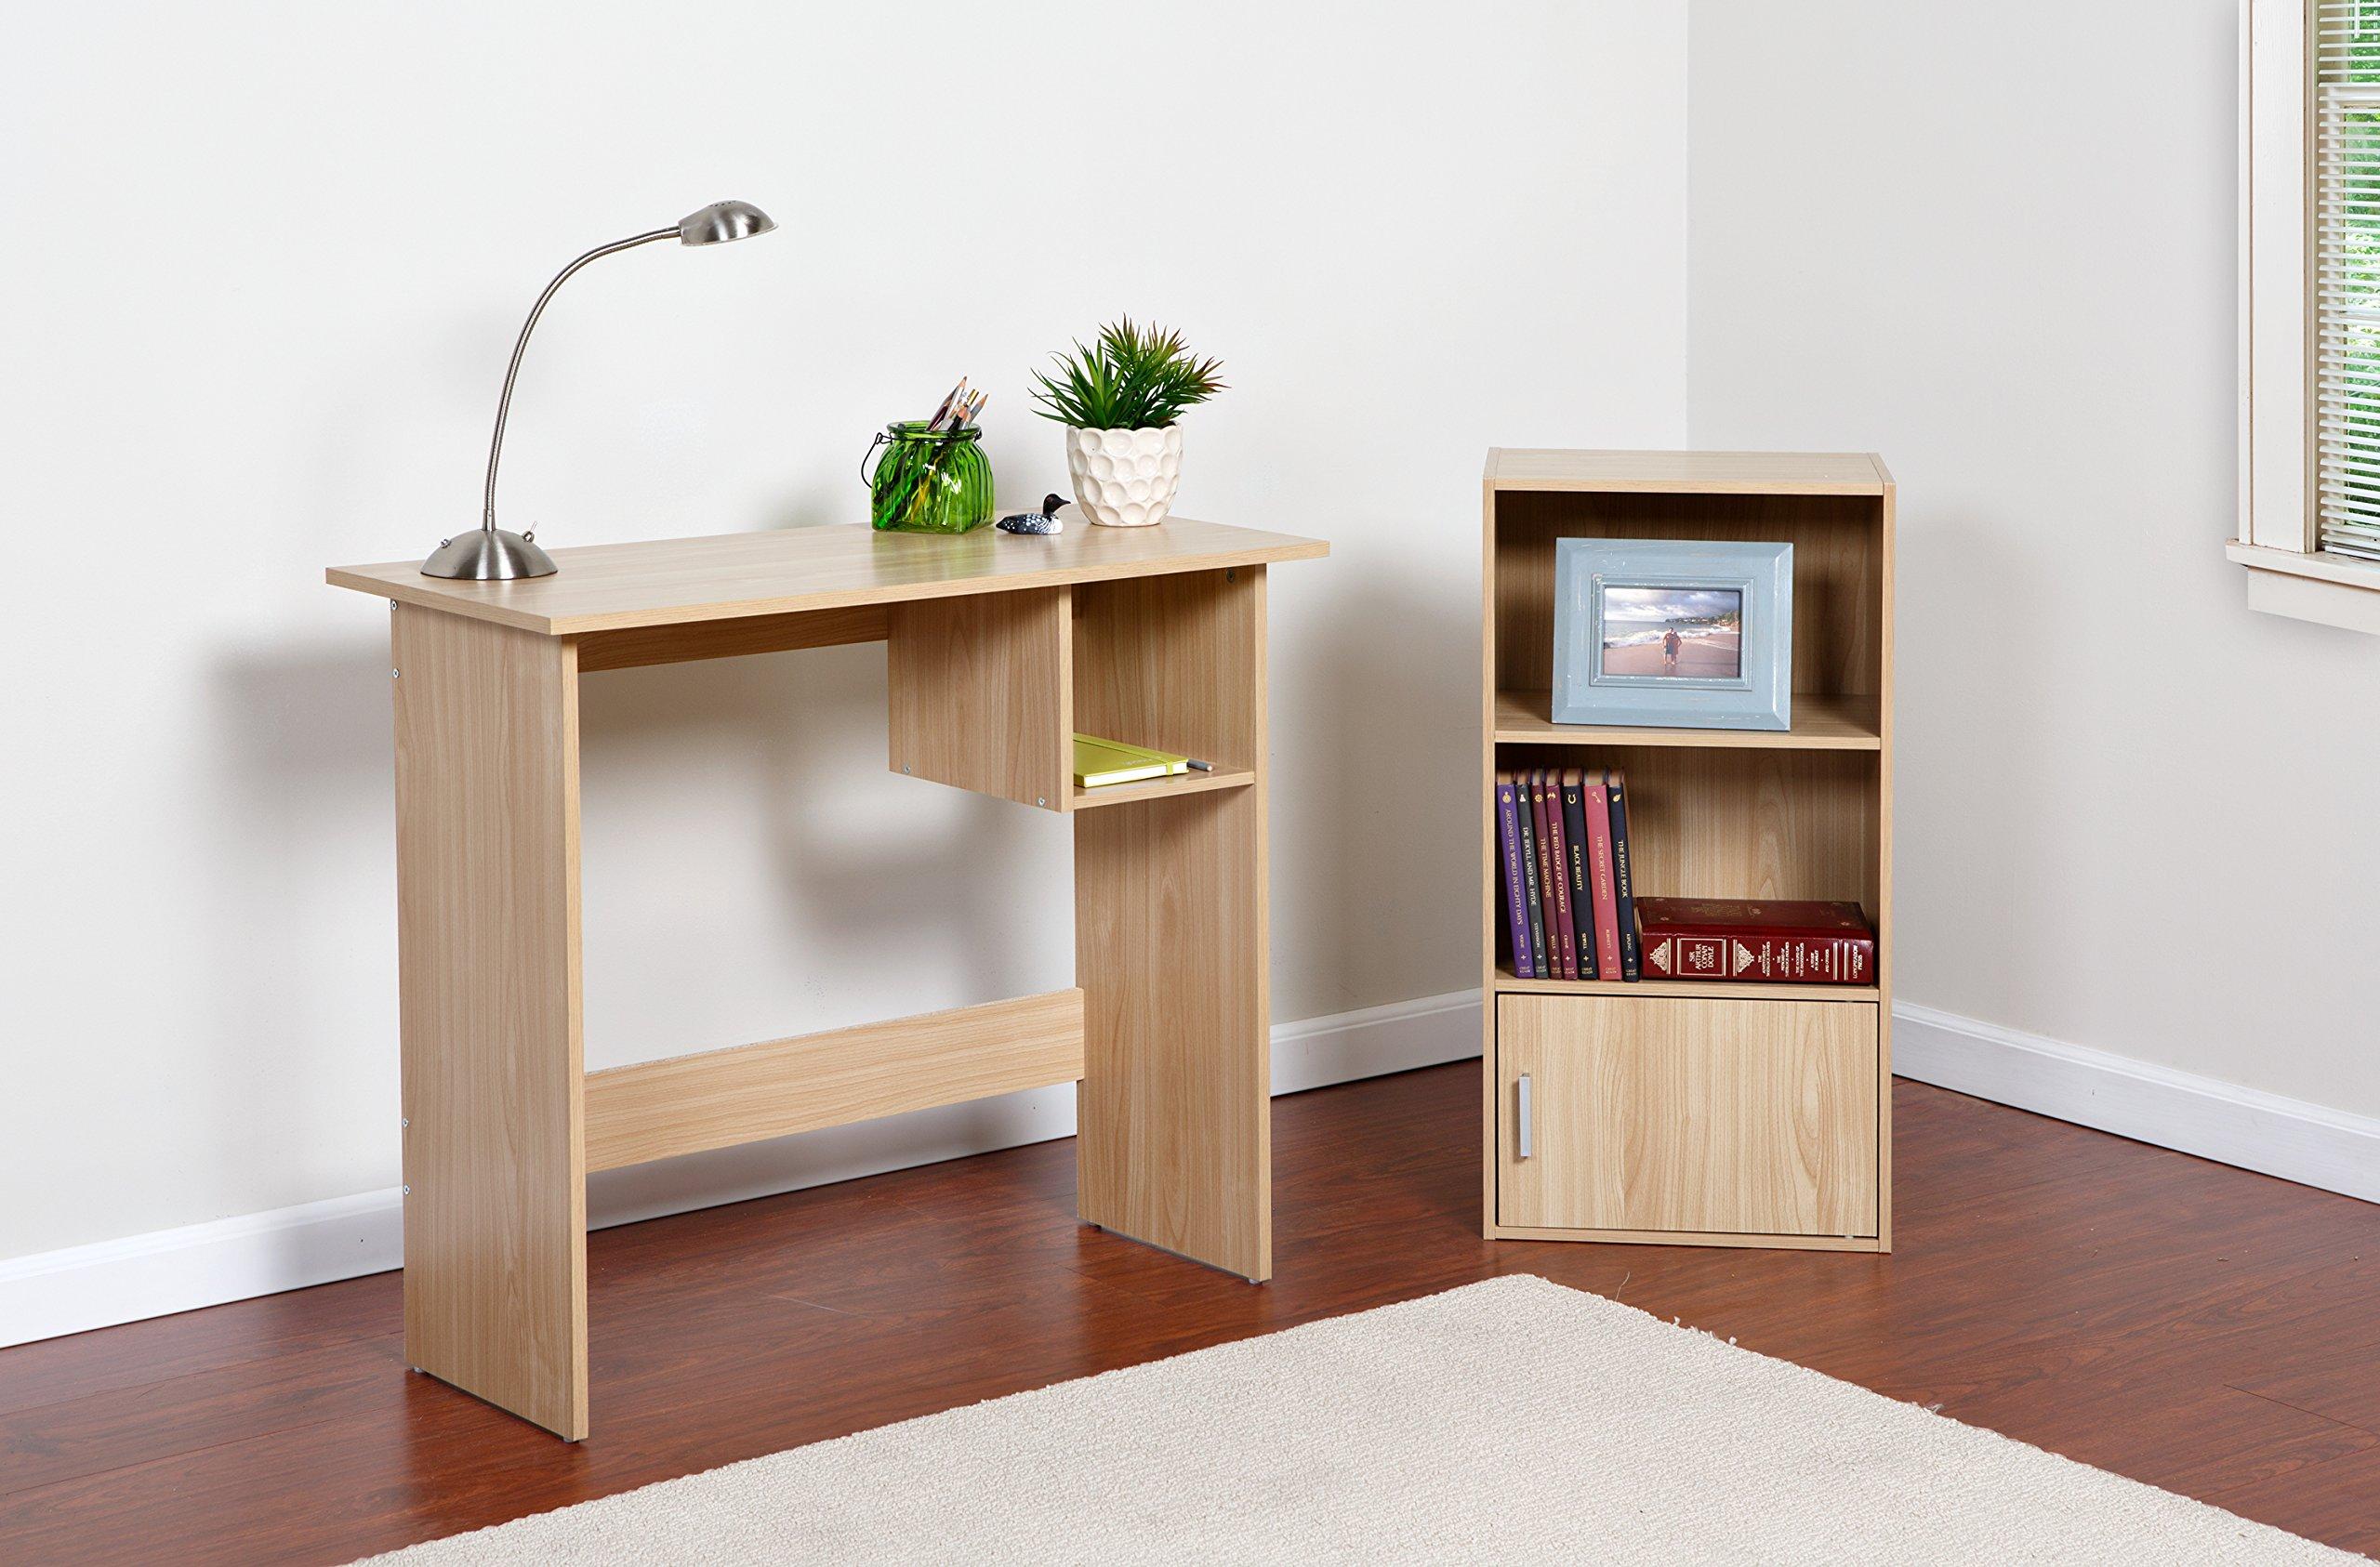 Comfort Products Small Modern Bookshelf, Oak